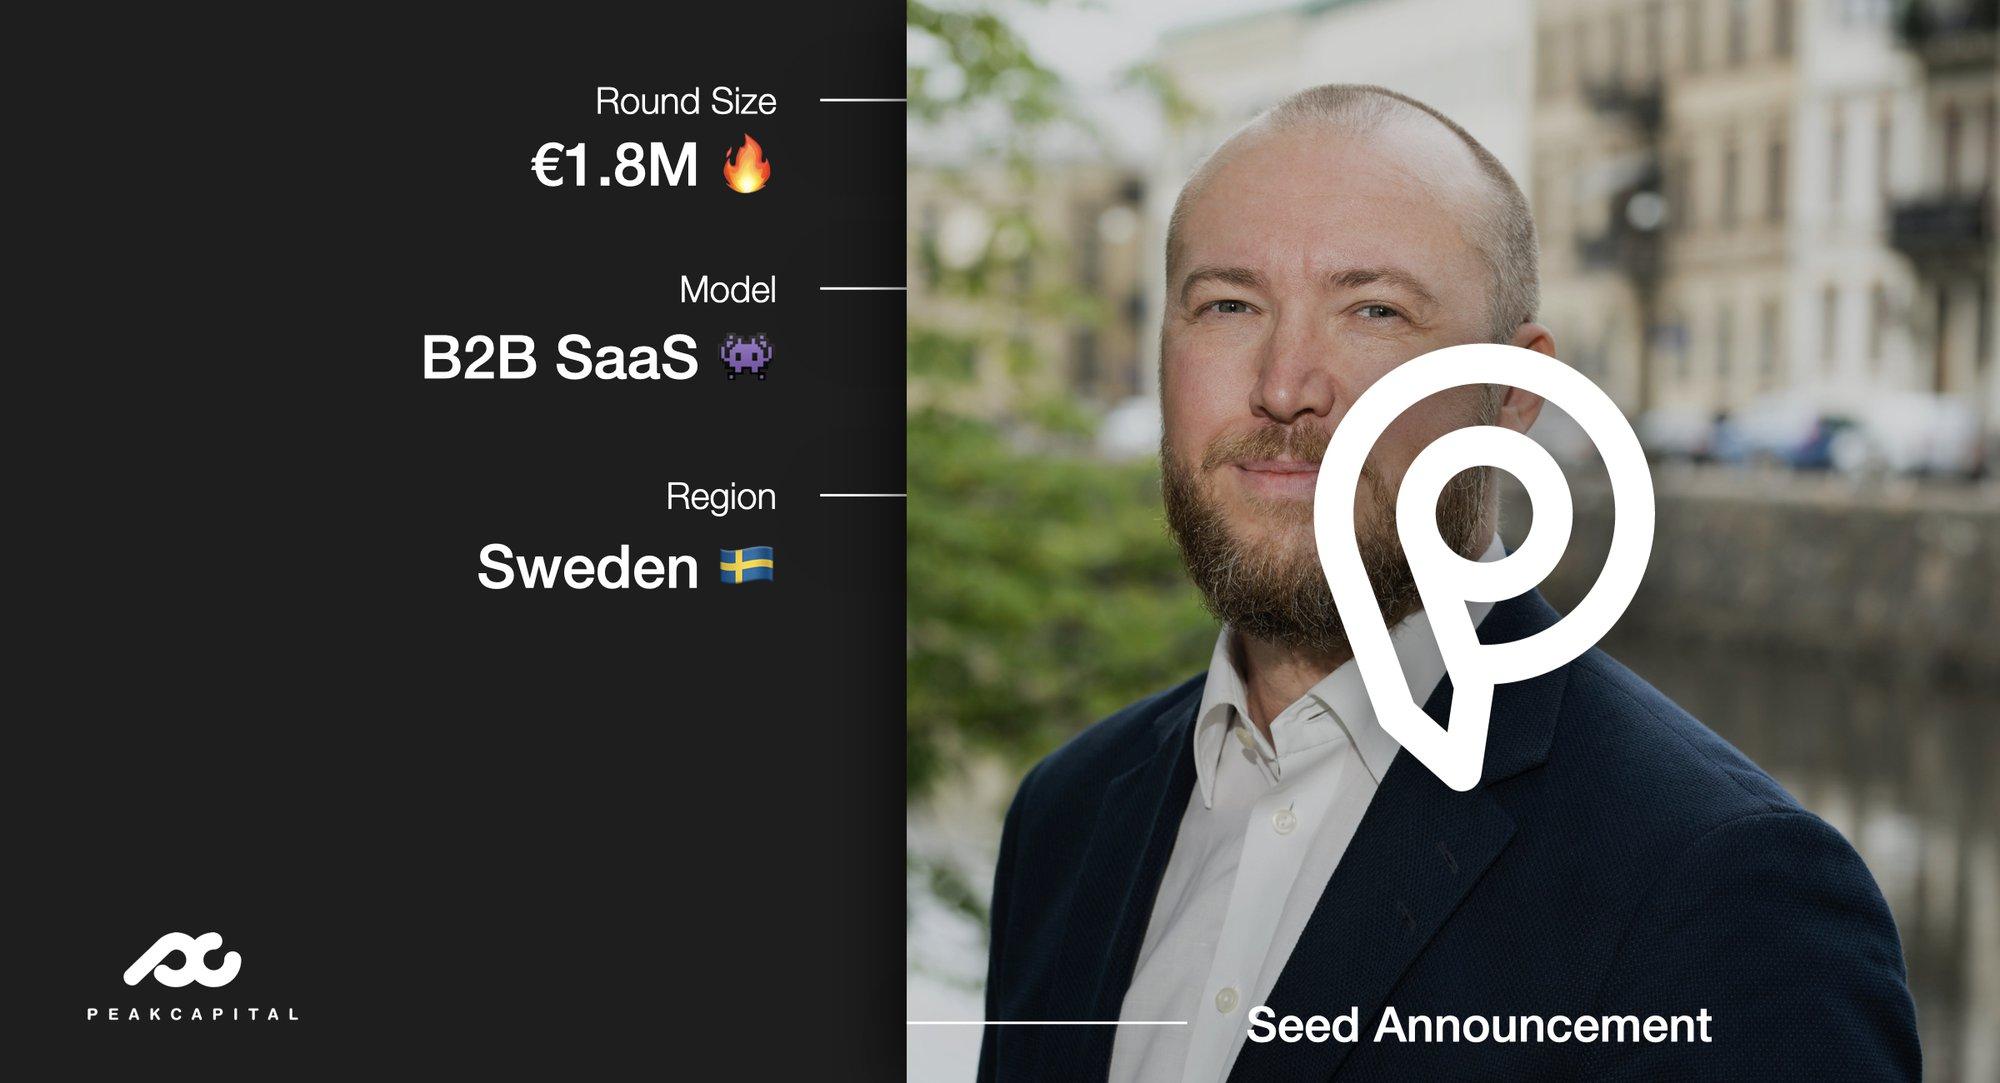 Peak Capital invests €1.8M in Swedish legaltech platform Precisely